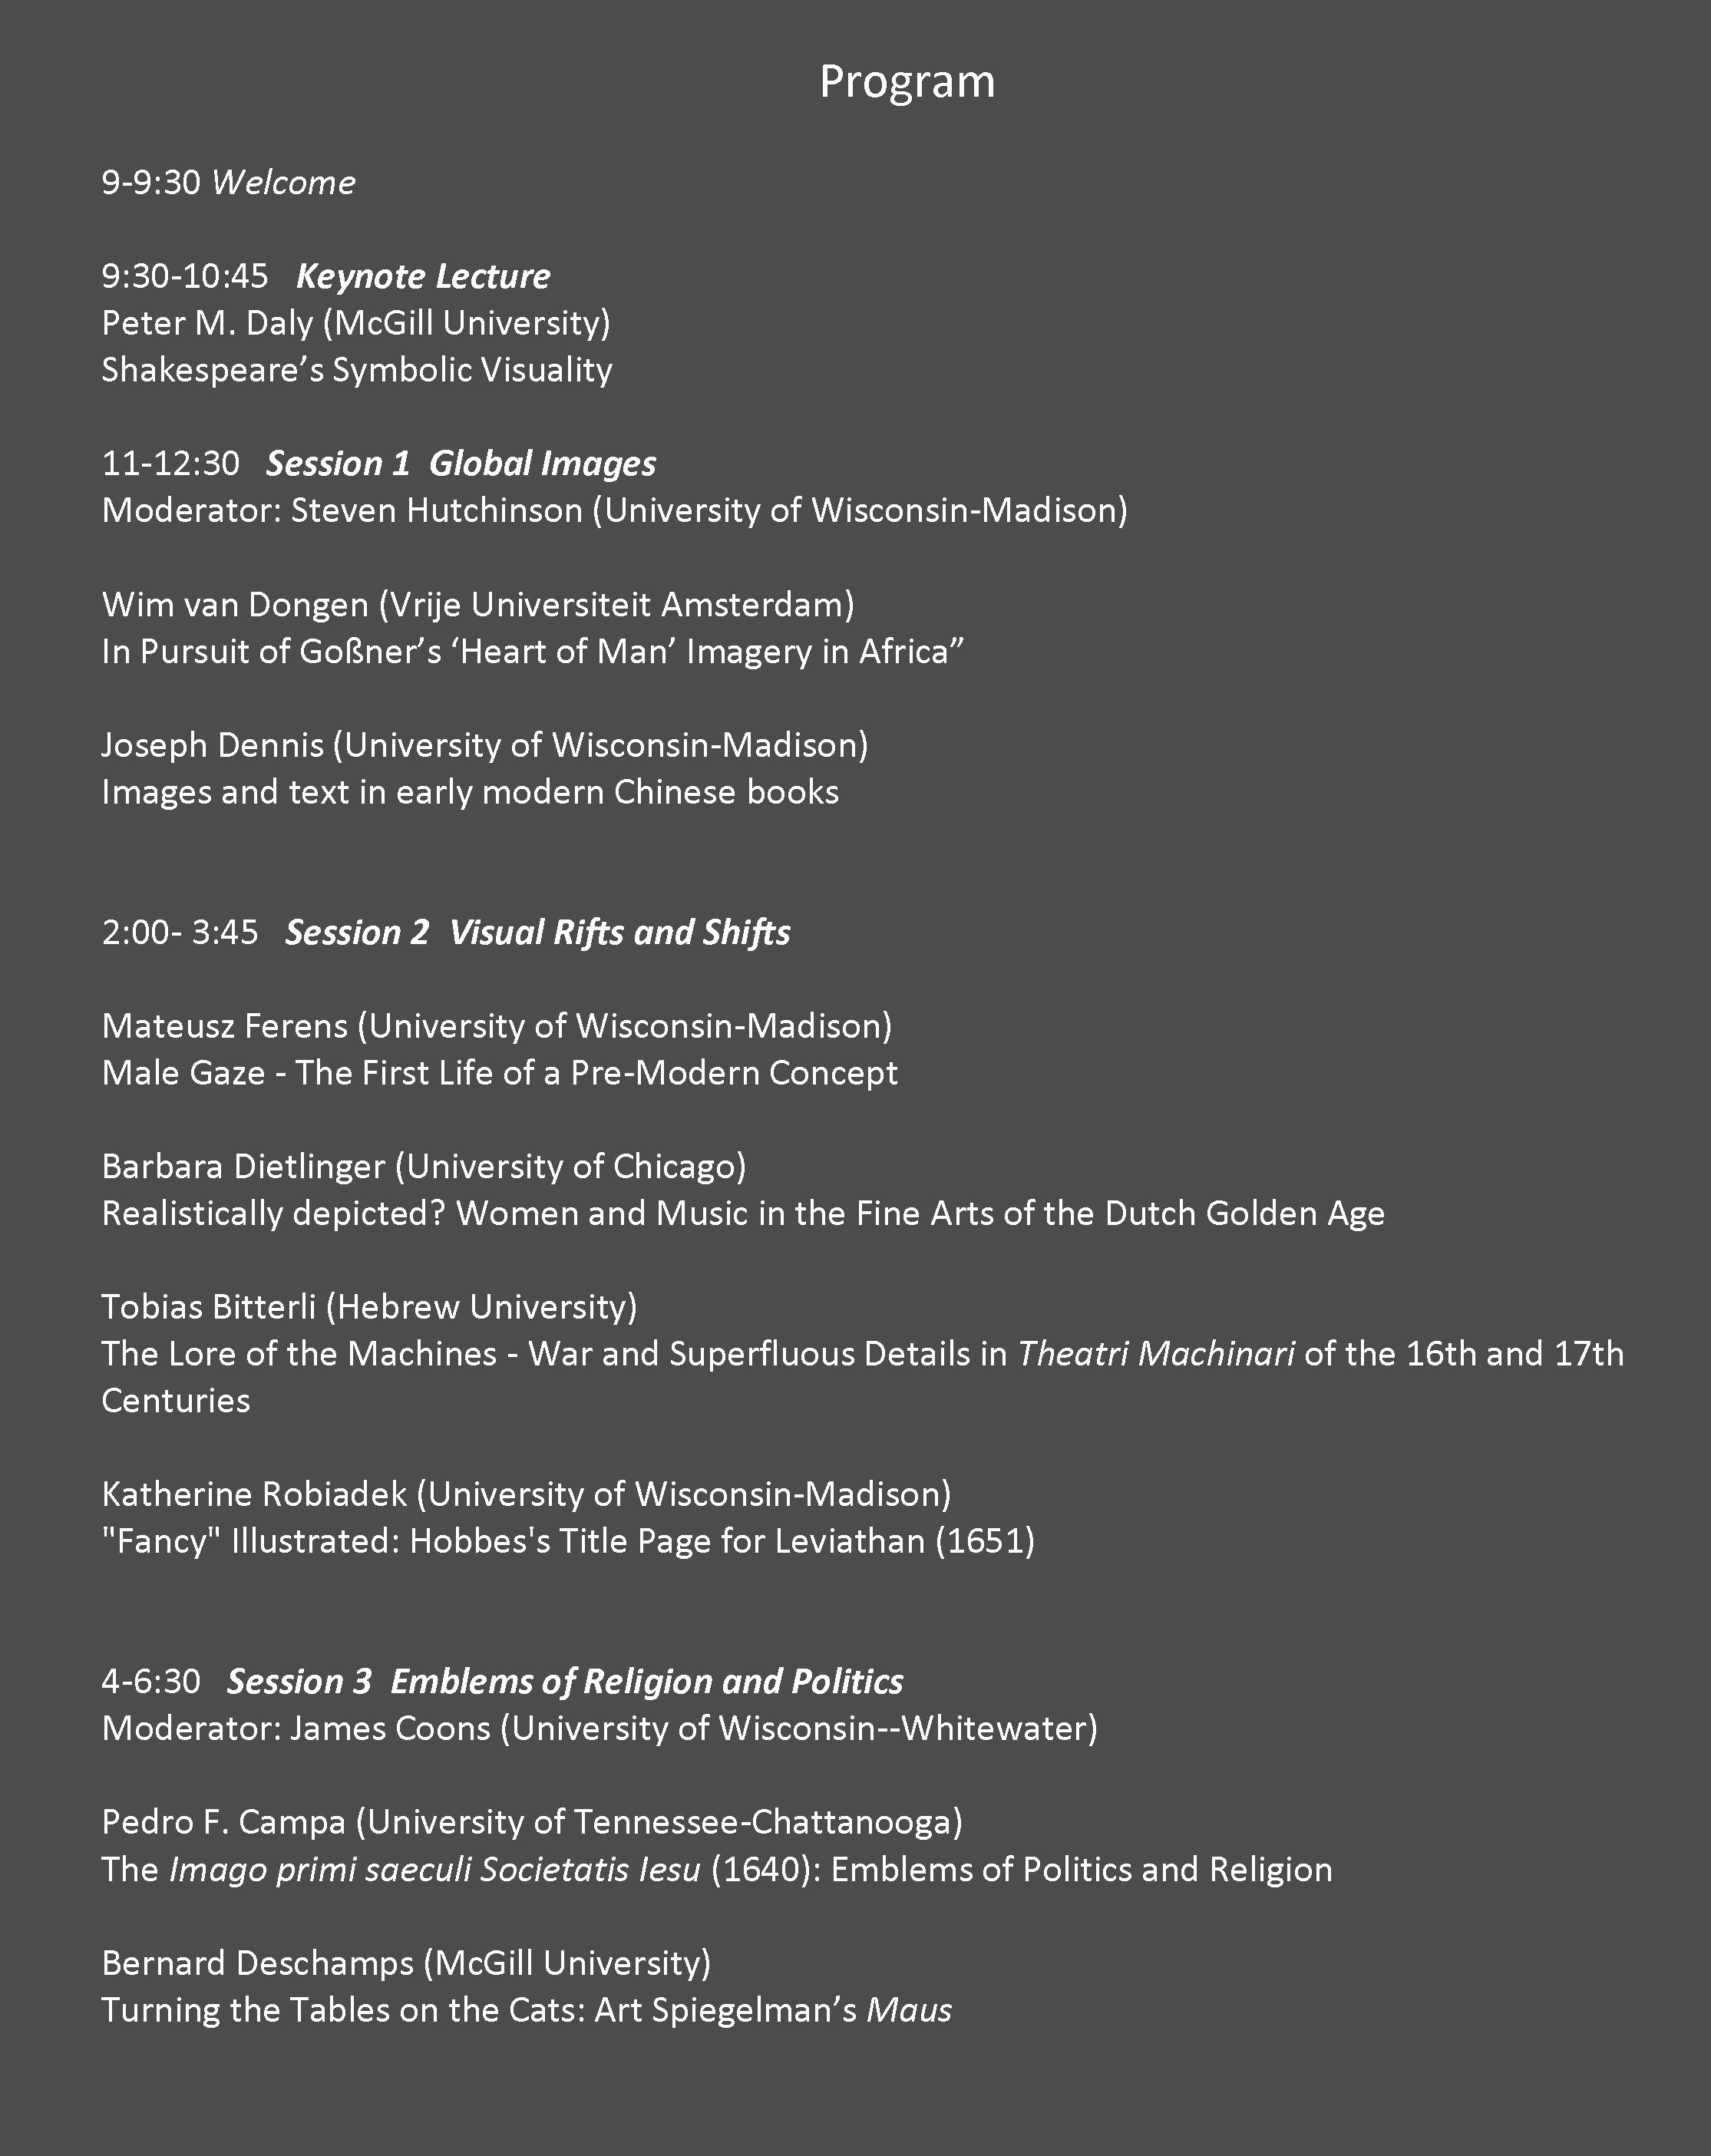 CEMS Symposium and Workshop Program-2